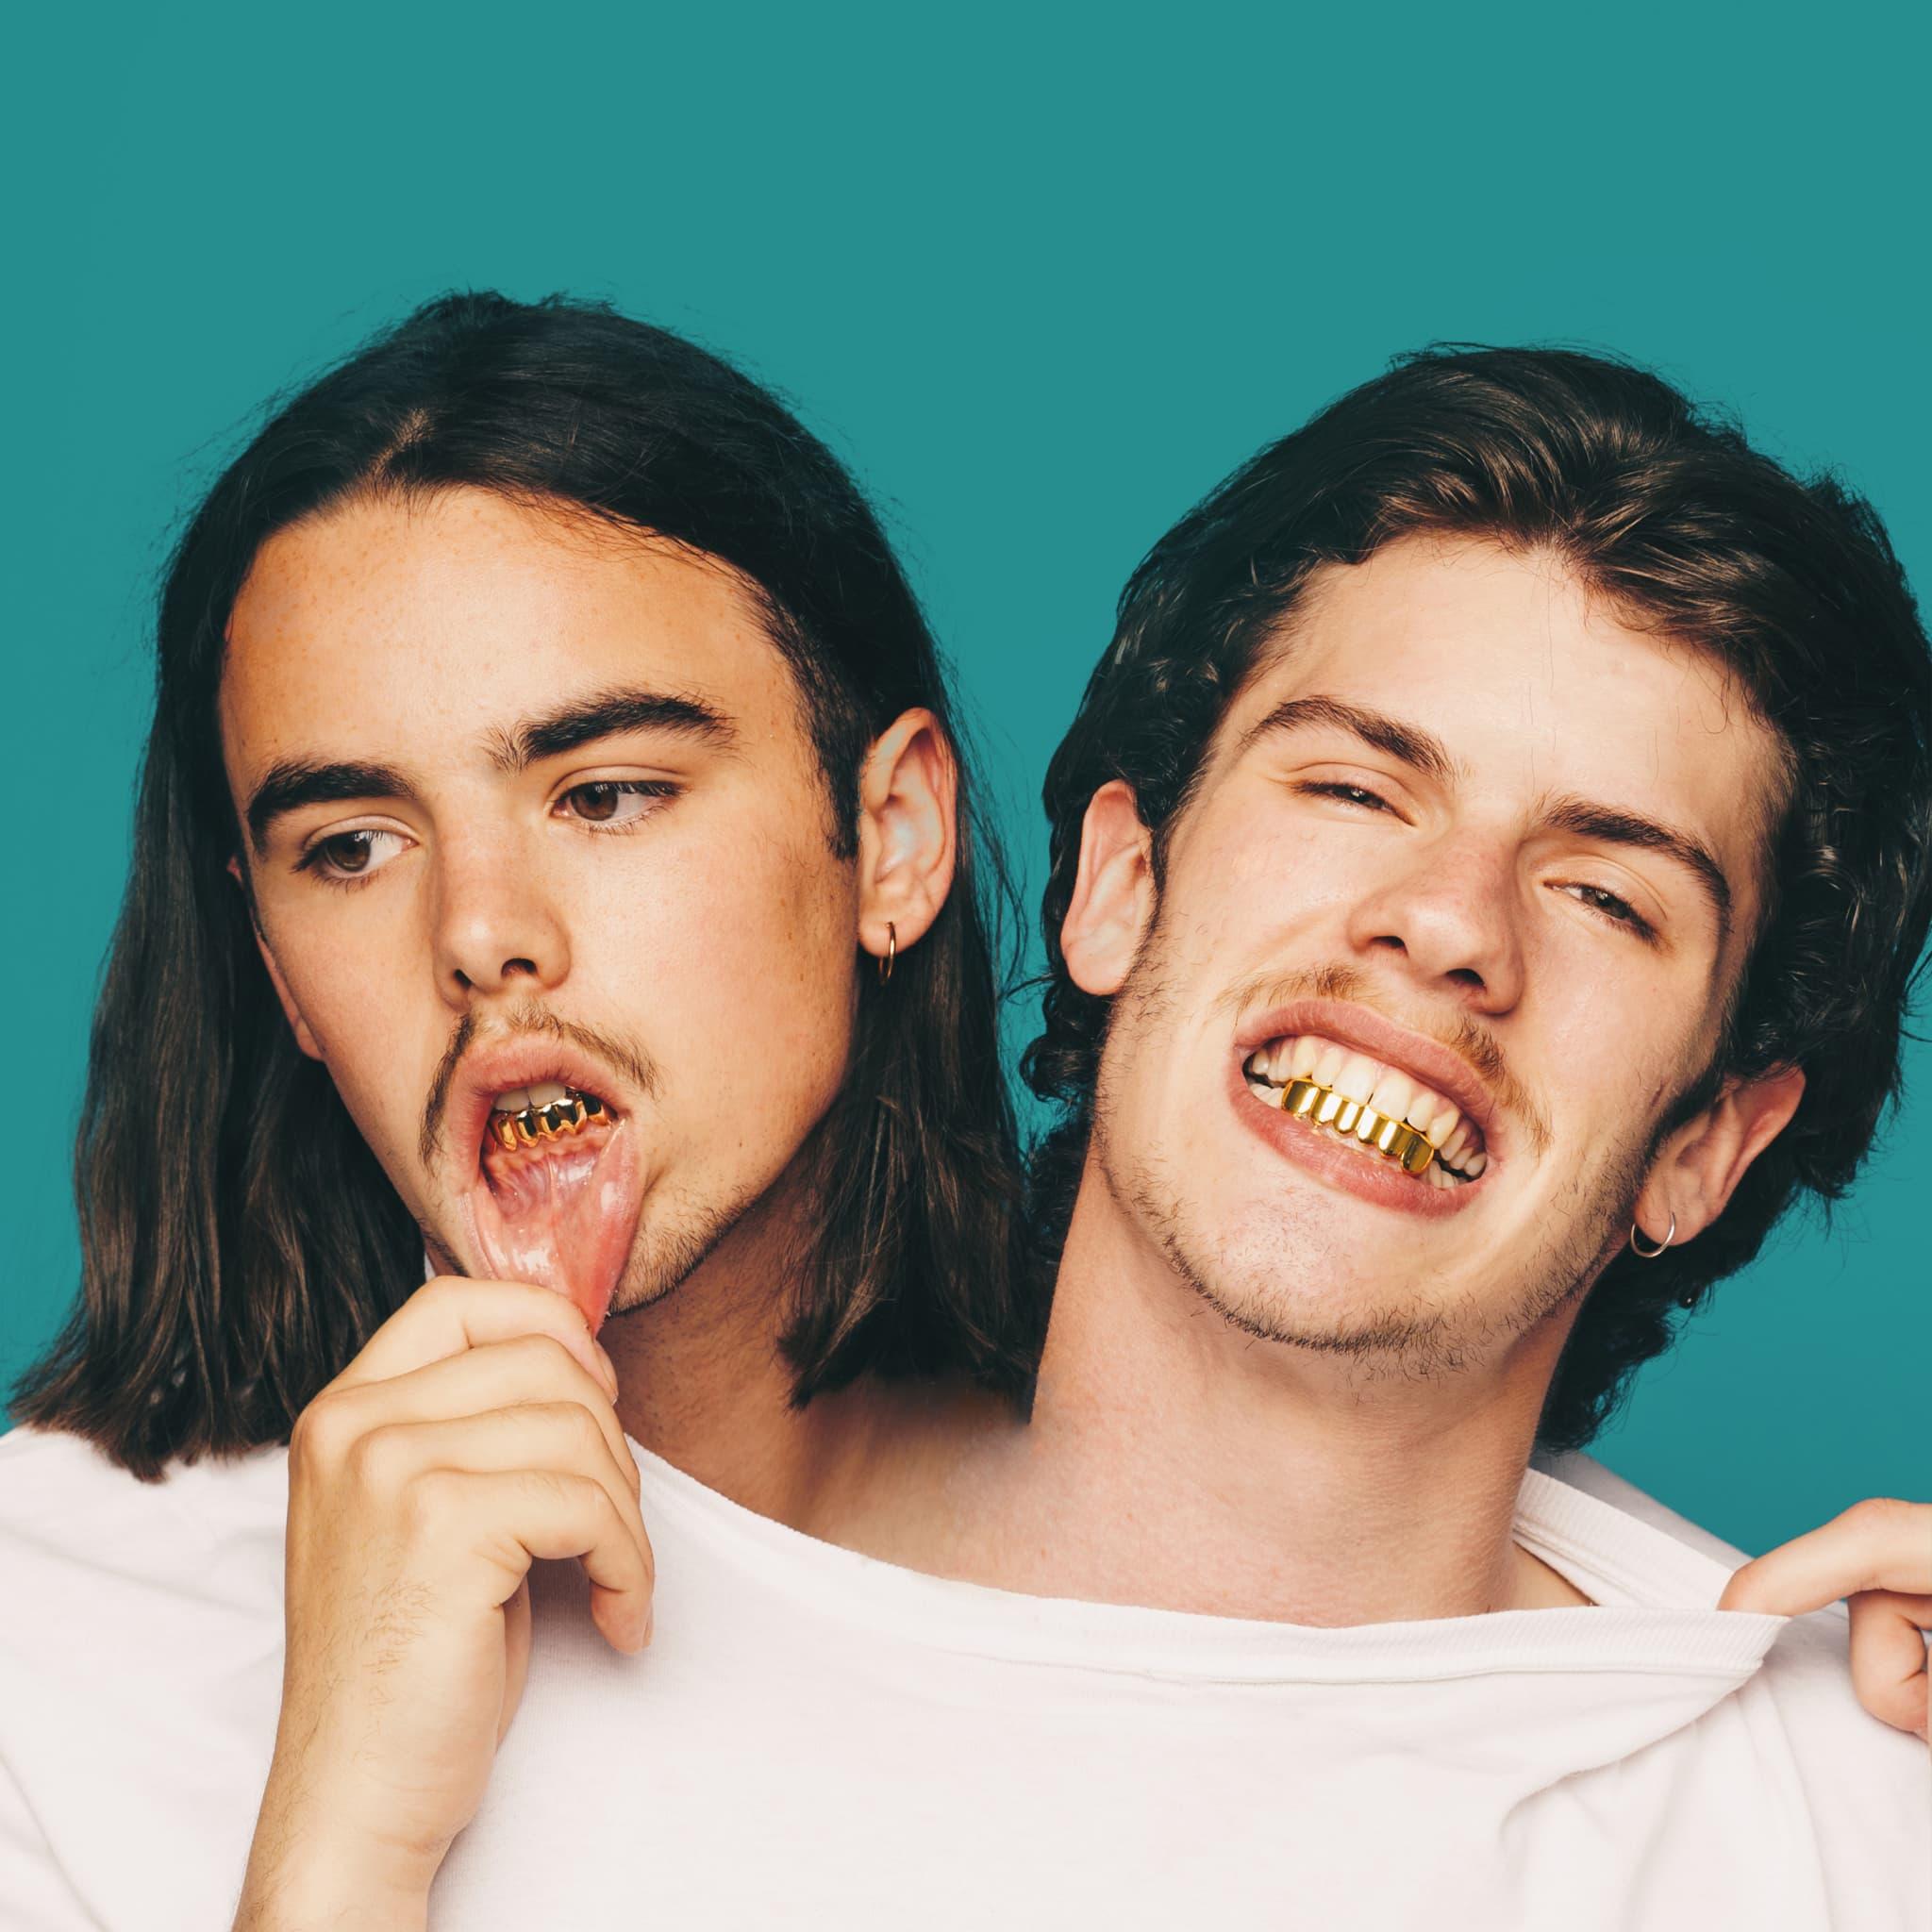 ULTRA, le deuxième EP de SEIN, sort ce vendredi 11 octobre 2019.